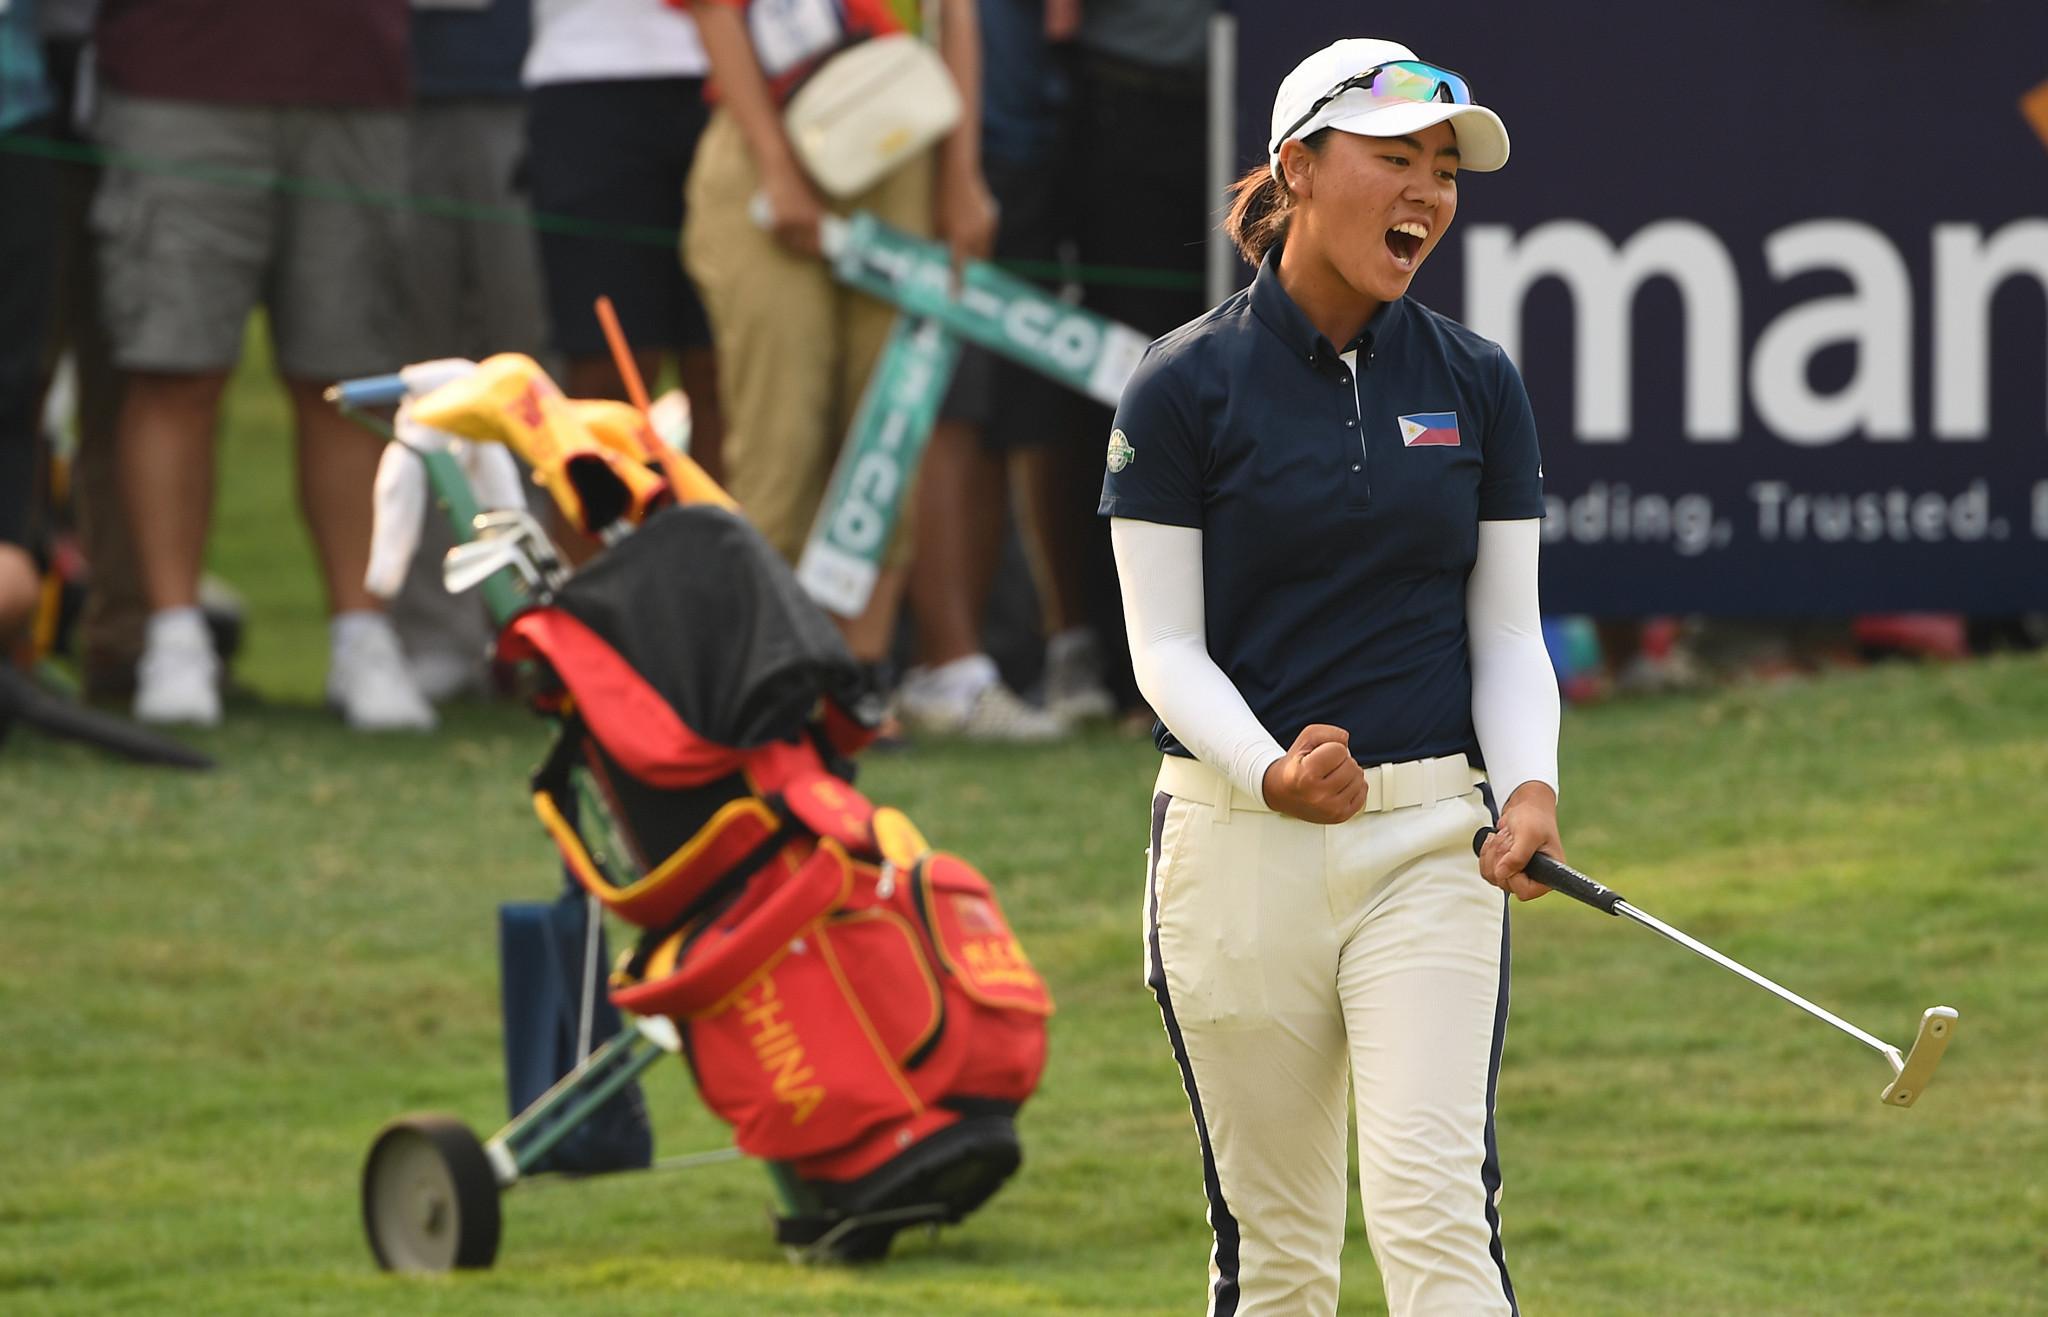 Yuka Saso won two gold medals for the Philippines at Jakarta-Palembang 2018 ©Getty Images